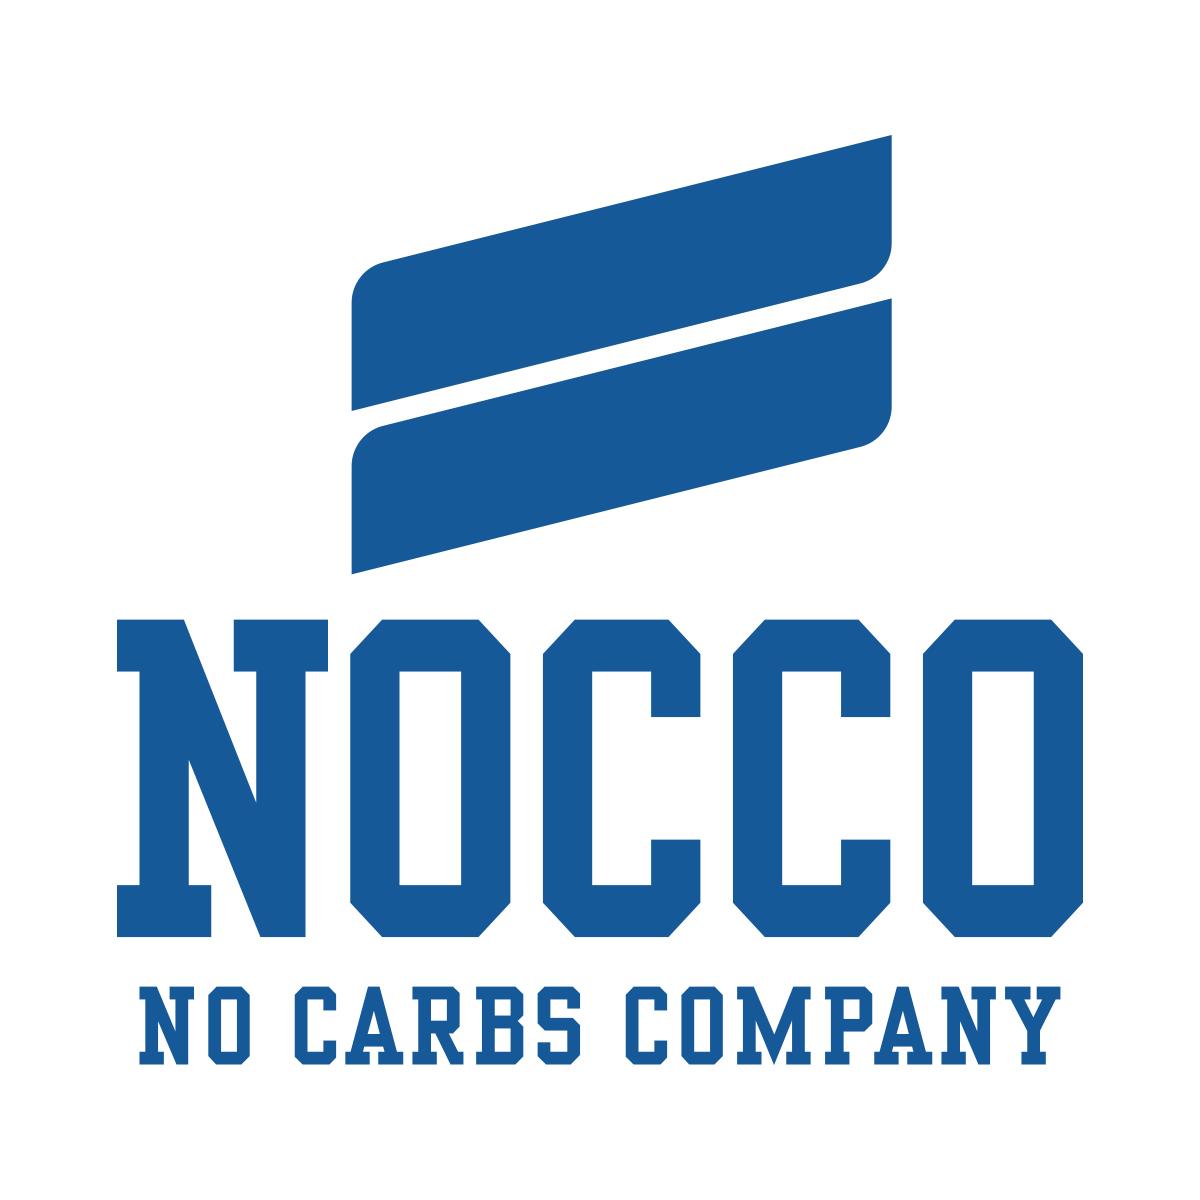 NOCCO_LOGO.jpg